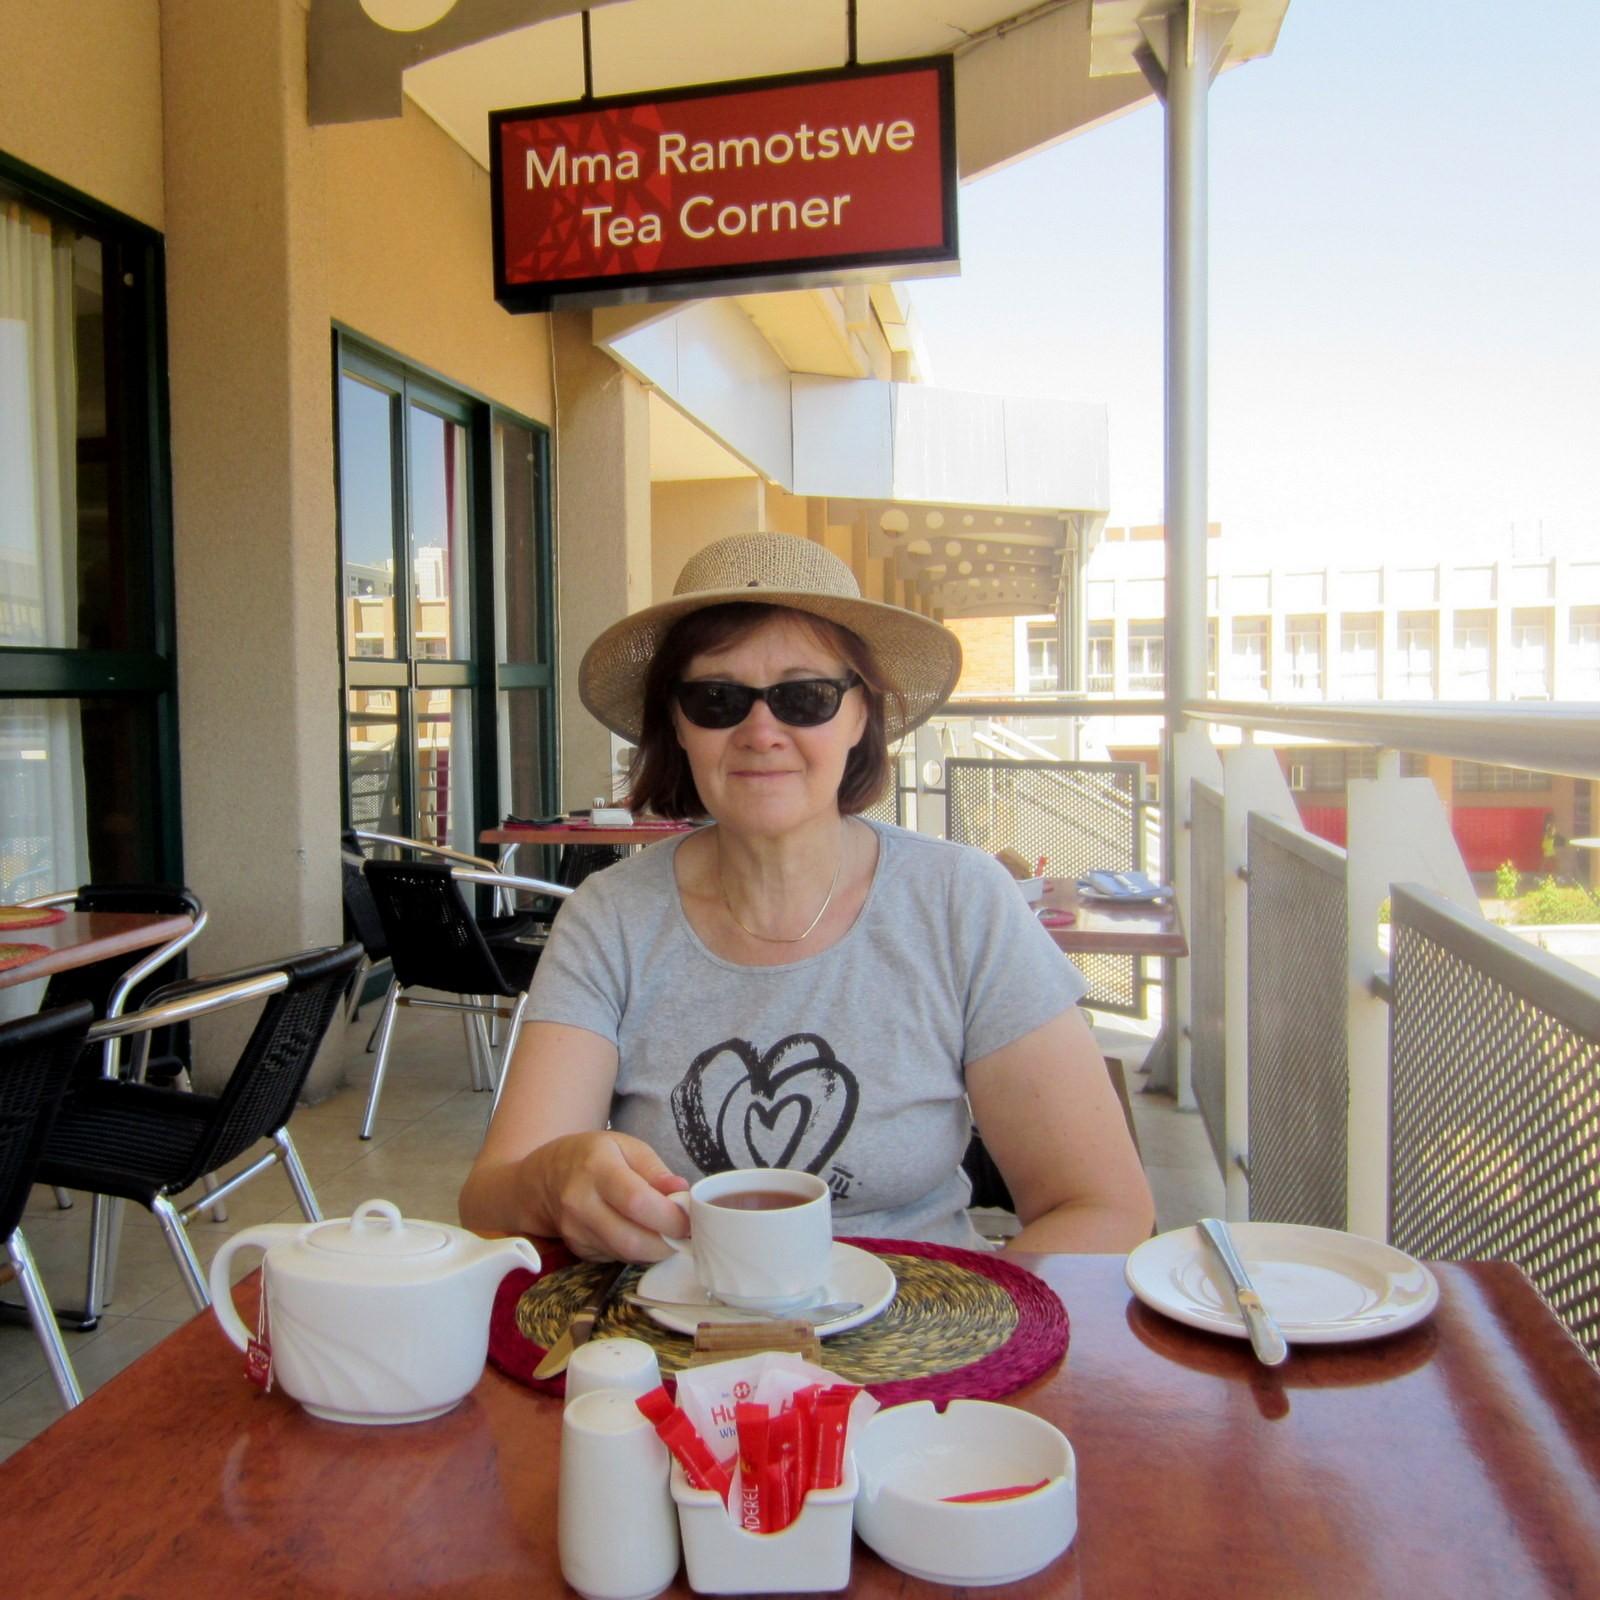 Mma Ramotswe Tea Corner Gaborone